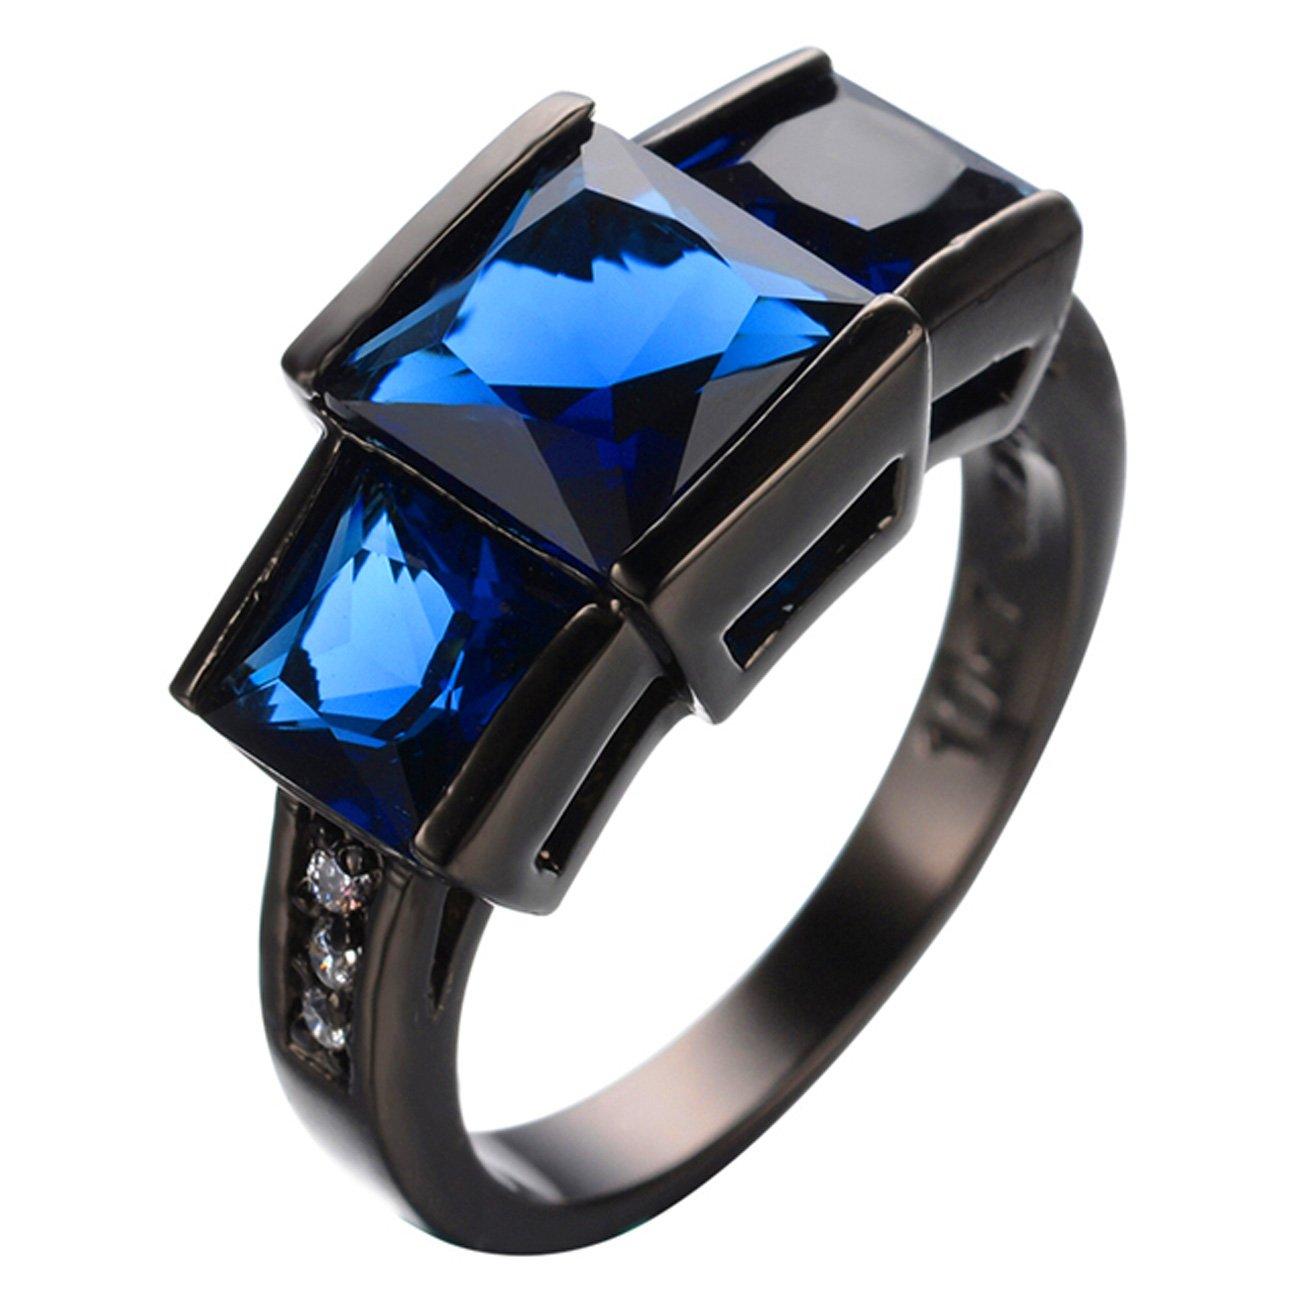 JBL Promise Top Quality Blue Zircon Black Gold Filled Vintage Party Finger Engagement Wedding Ring